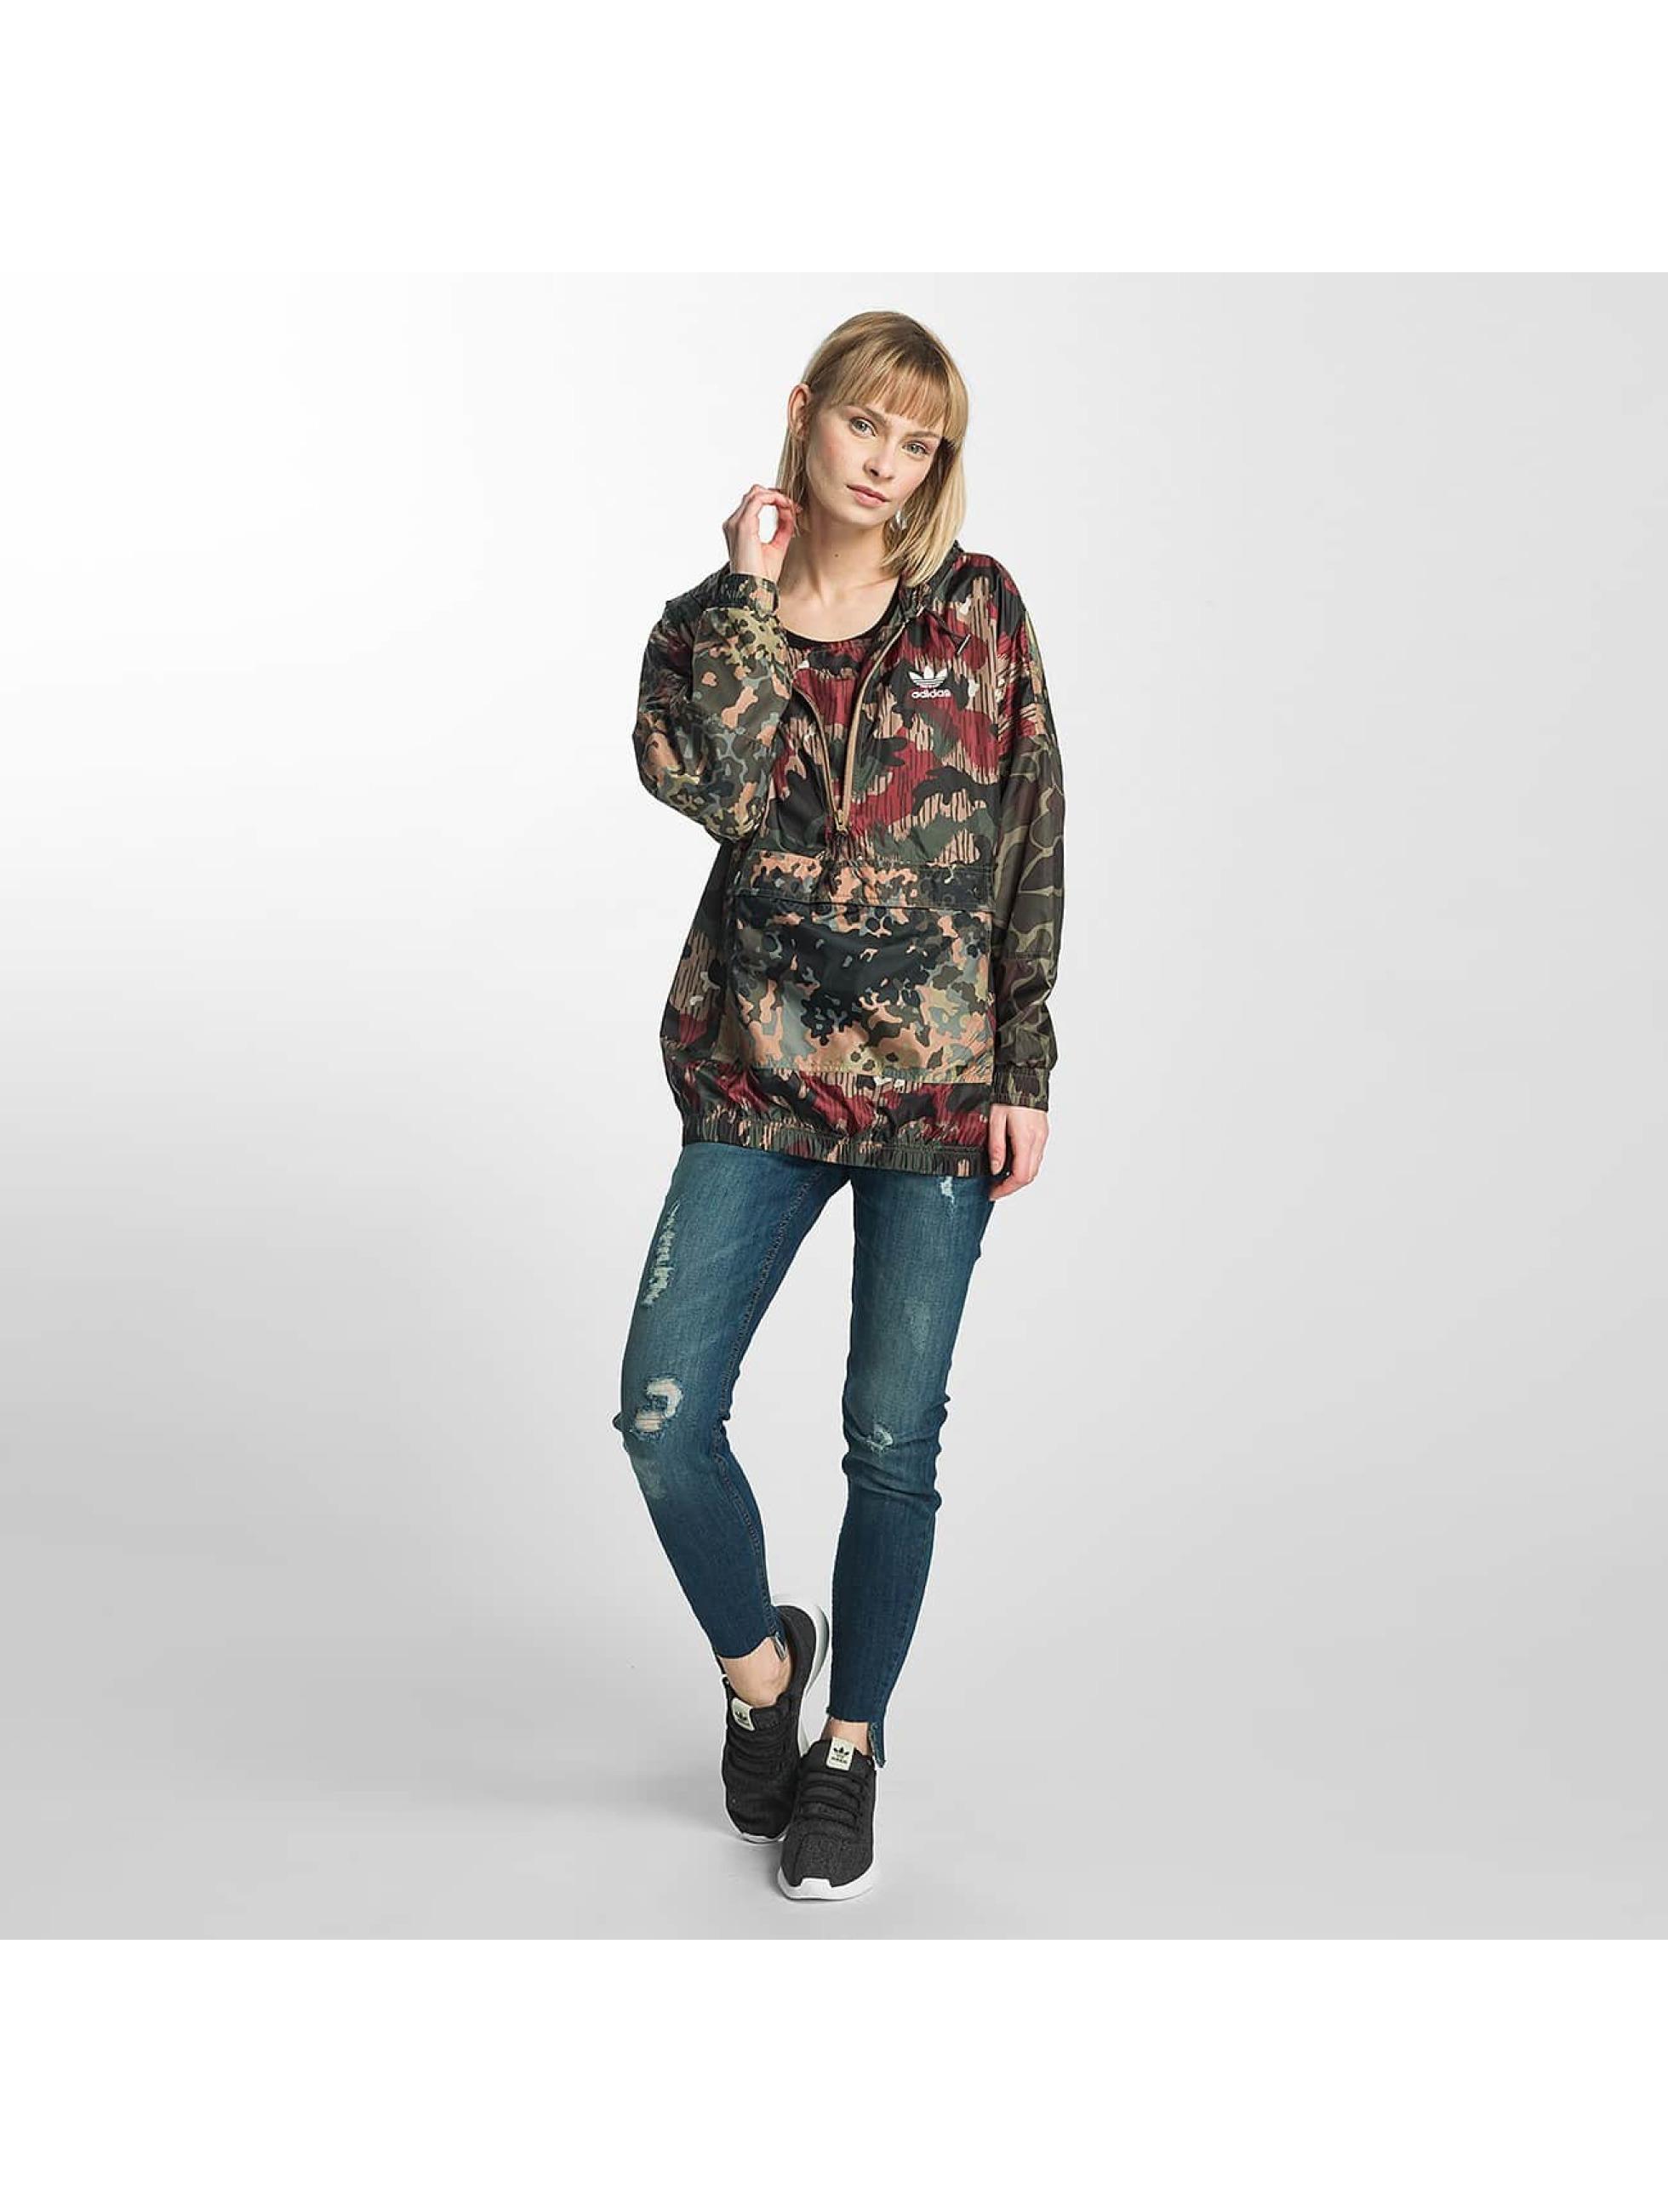 adidas damen bergangsjacke pw hu hiking in camouflage 369389. Black Bedroom Furniture Sets. Home Design Ideas